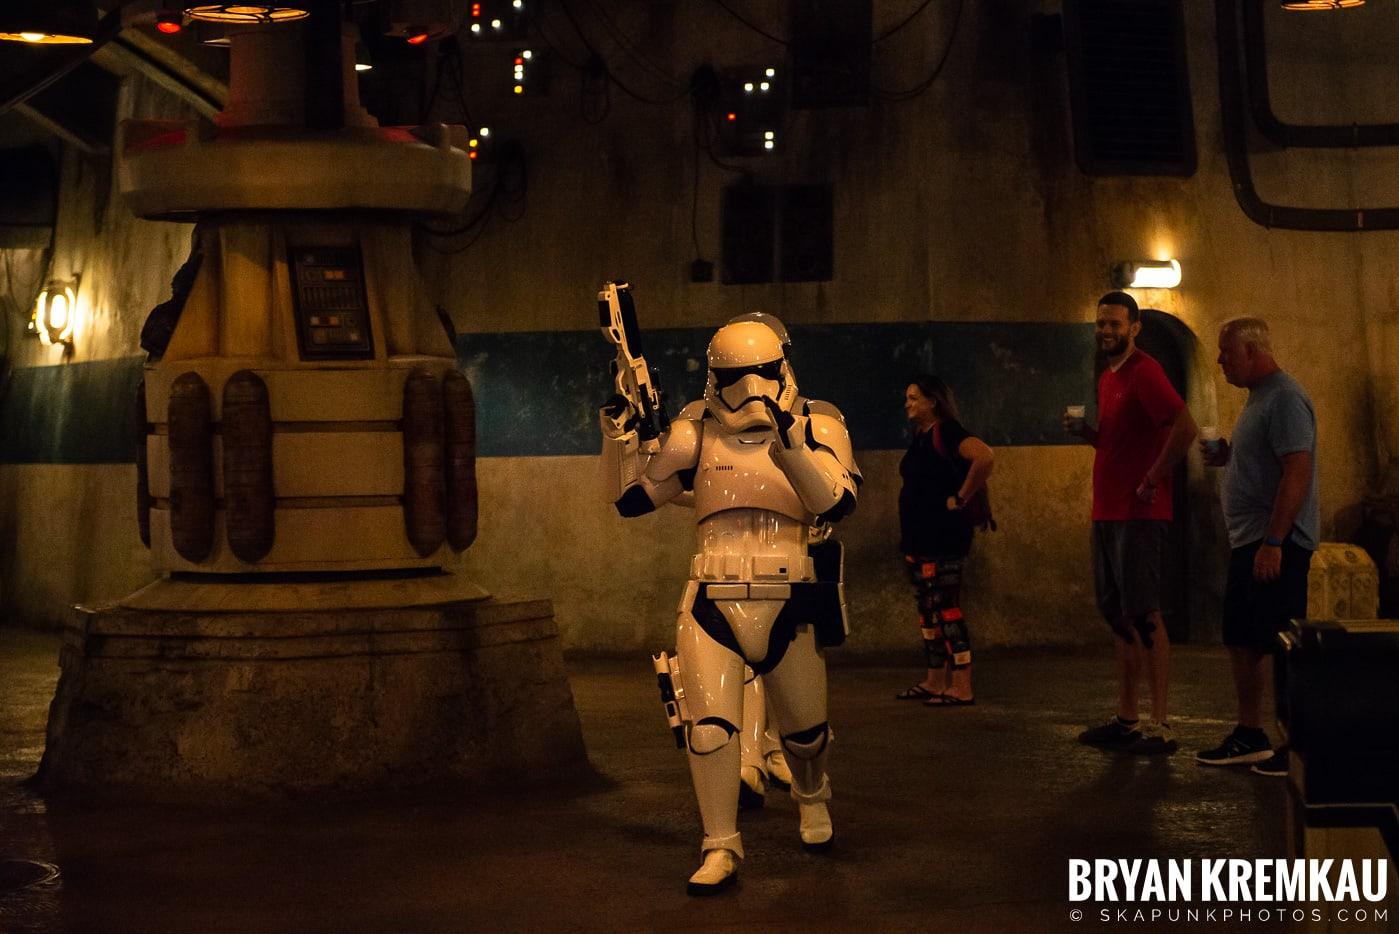 Walt Disney World Vacation: Day 5 (Animal Kingdom / Disney's Hollywood Studios) - 10.3.19 (5)